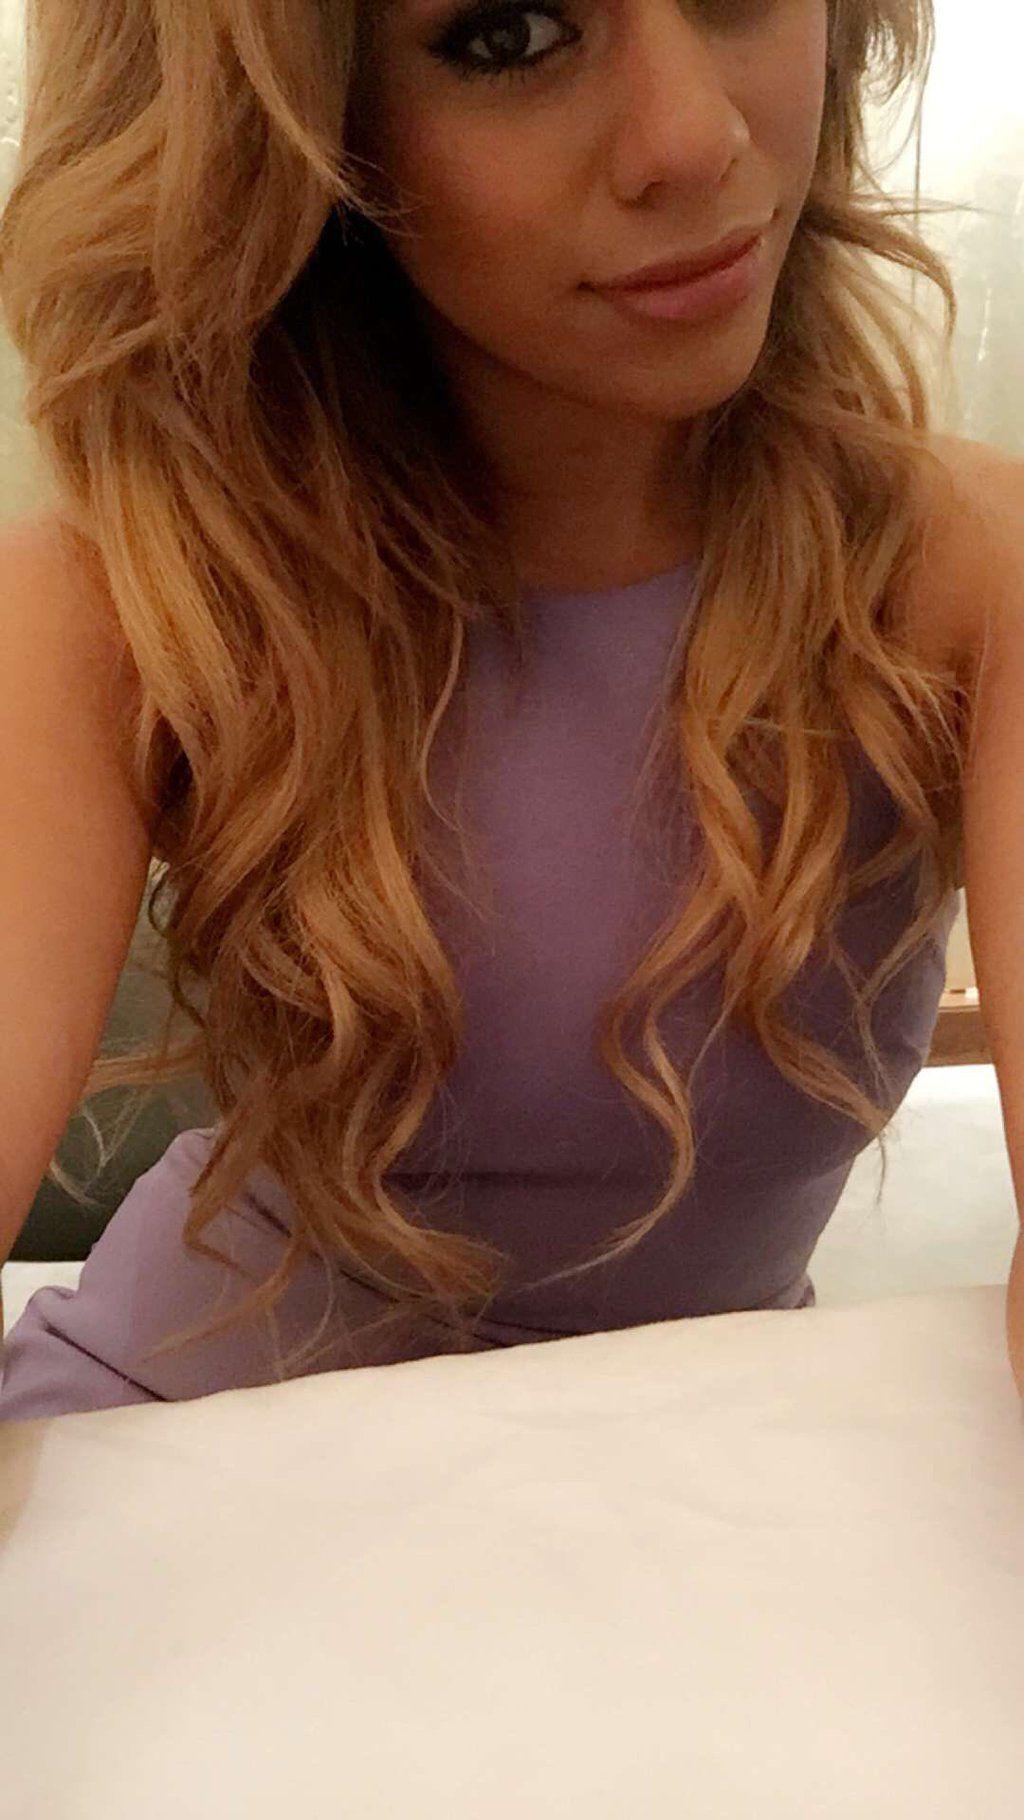 Dinah\u0027s snapchat story | 5H on Snapchat | Pinterest | Snapchat ...